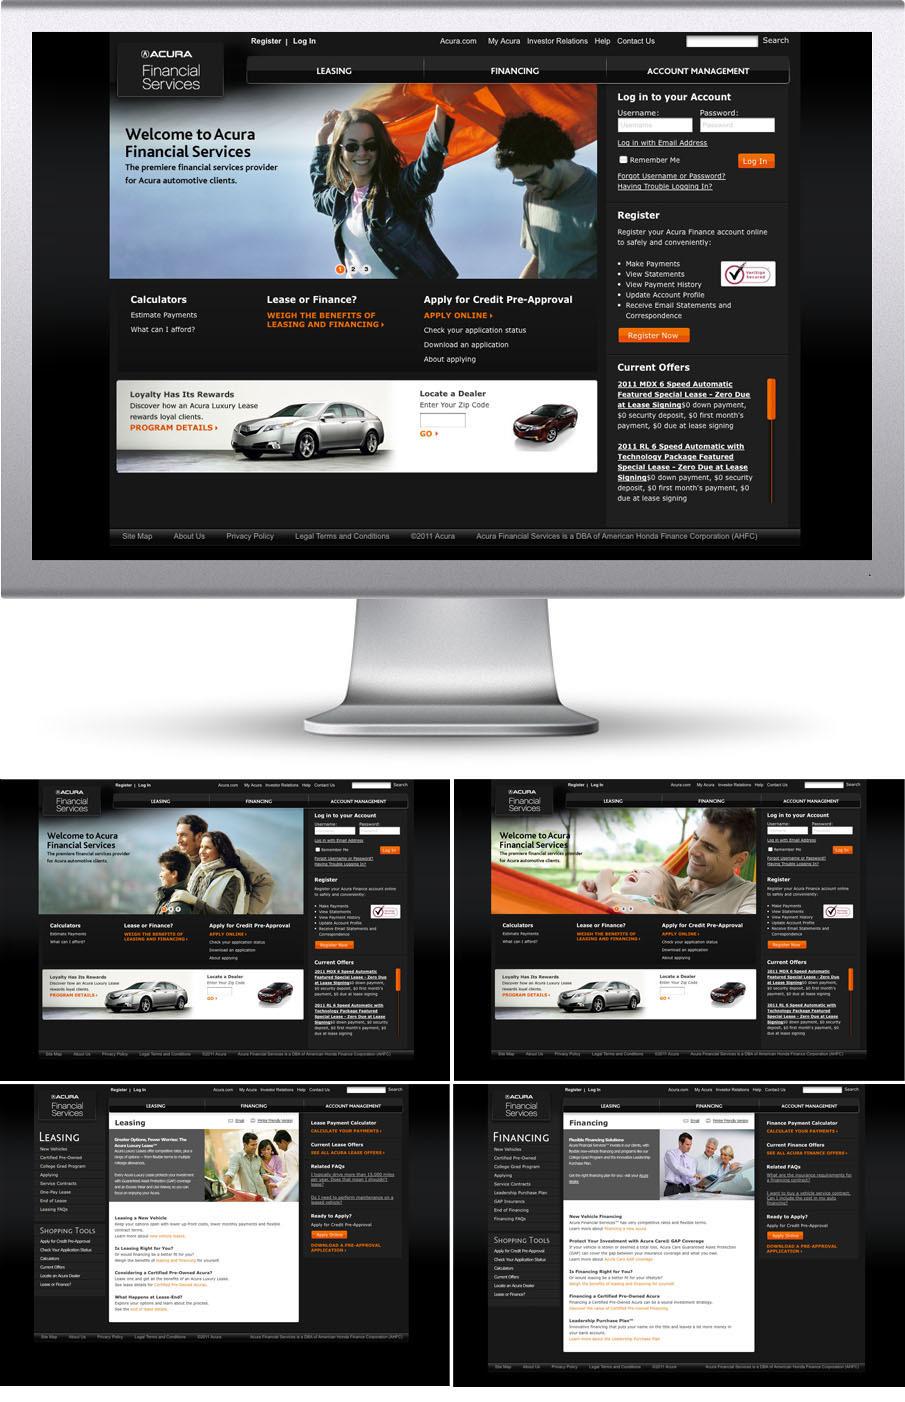 Hondafinancialservices Com Account Management >> Acura Financial Services S2